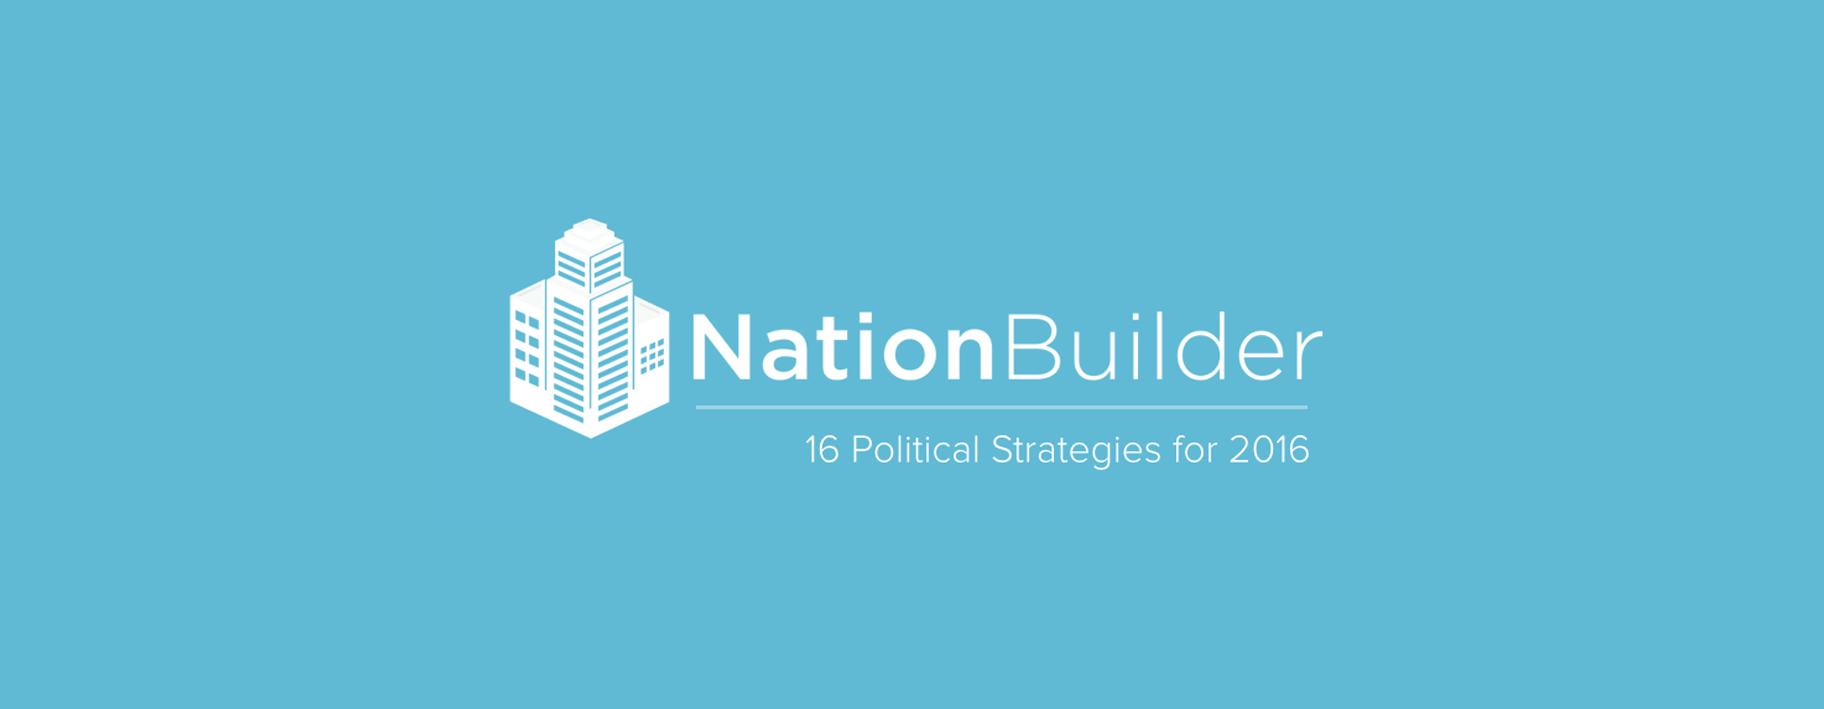 16_political_strategies_for_2016-wide.jpg